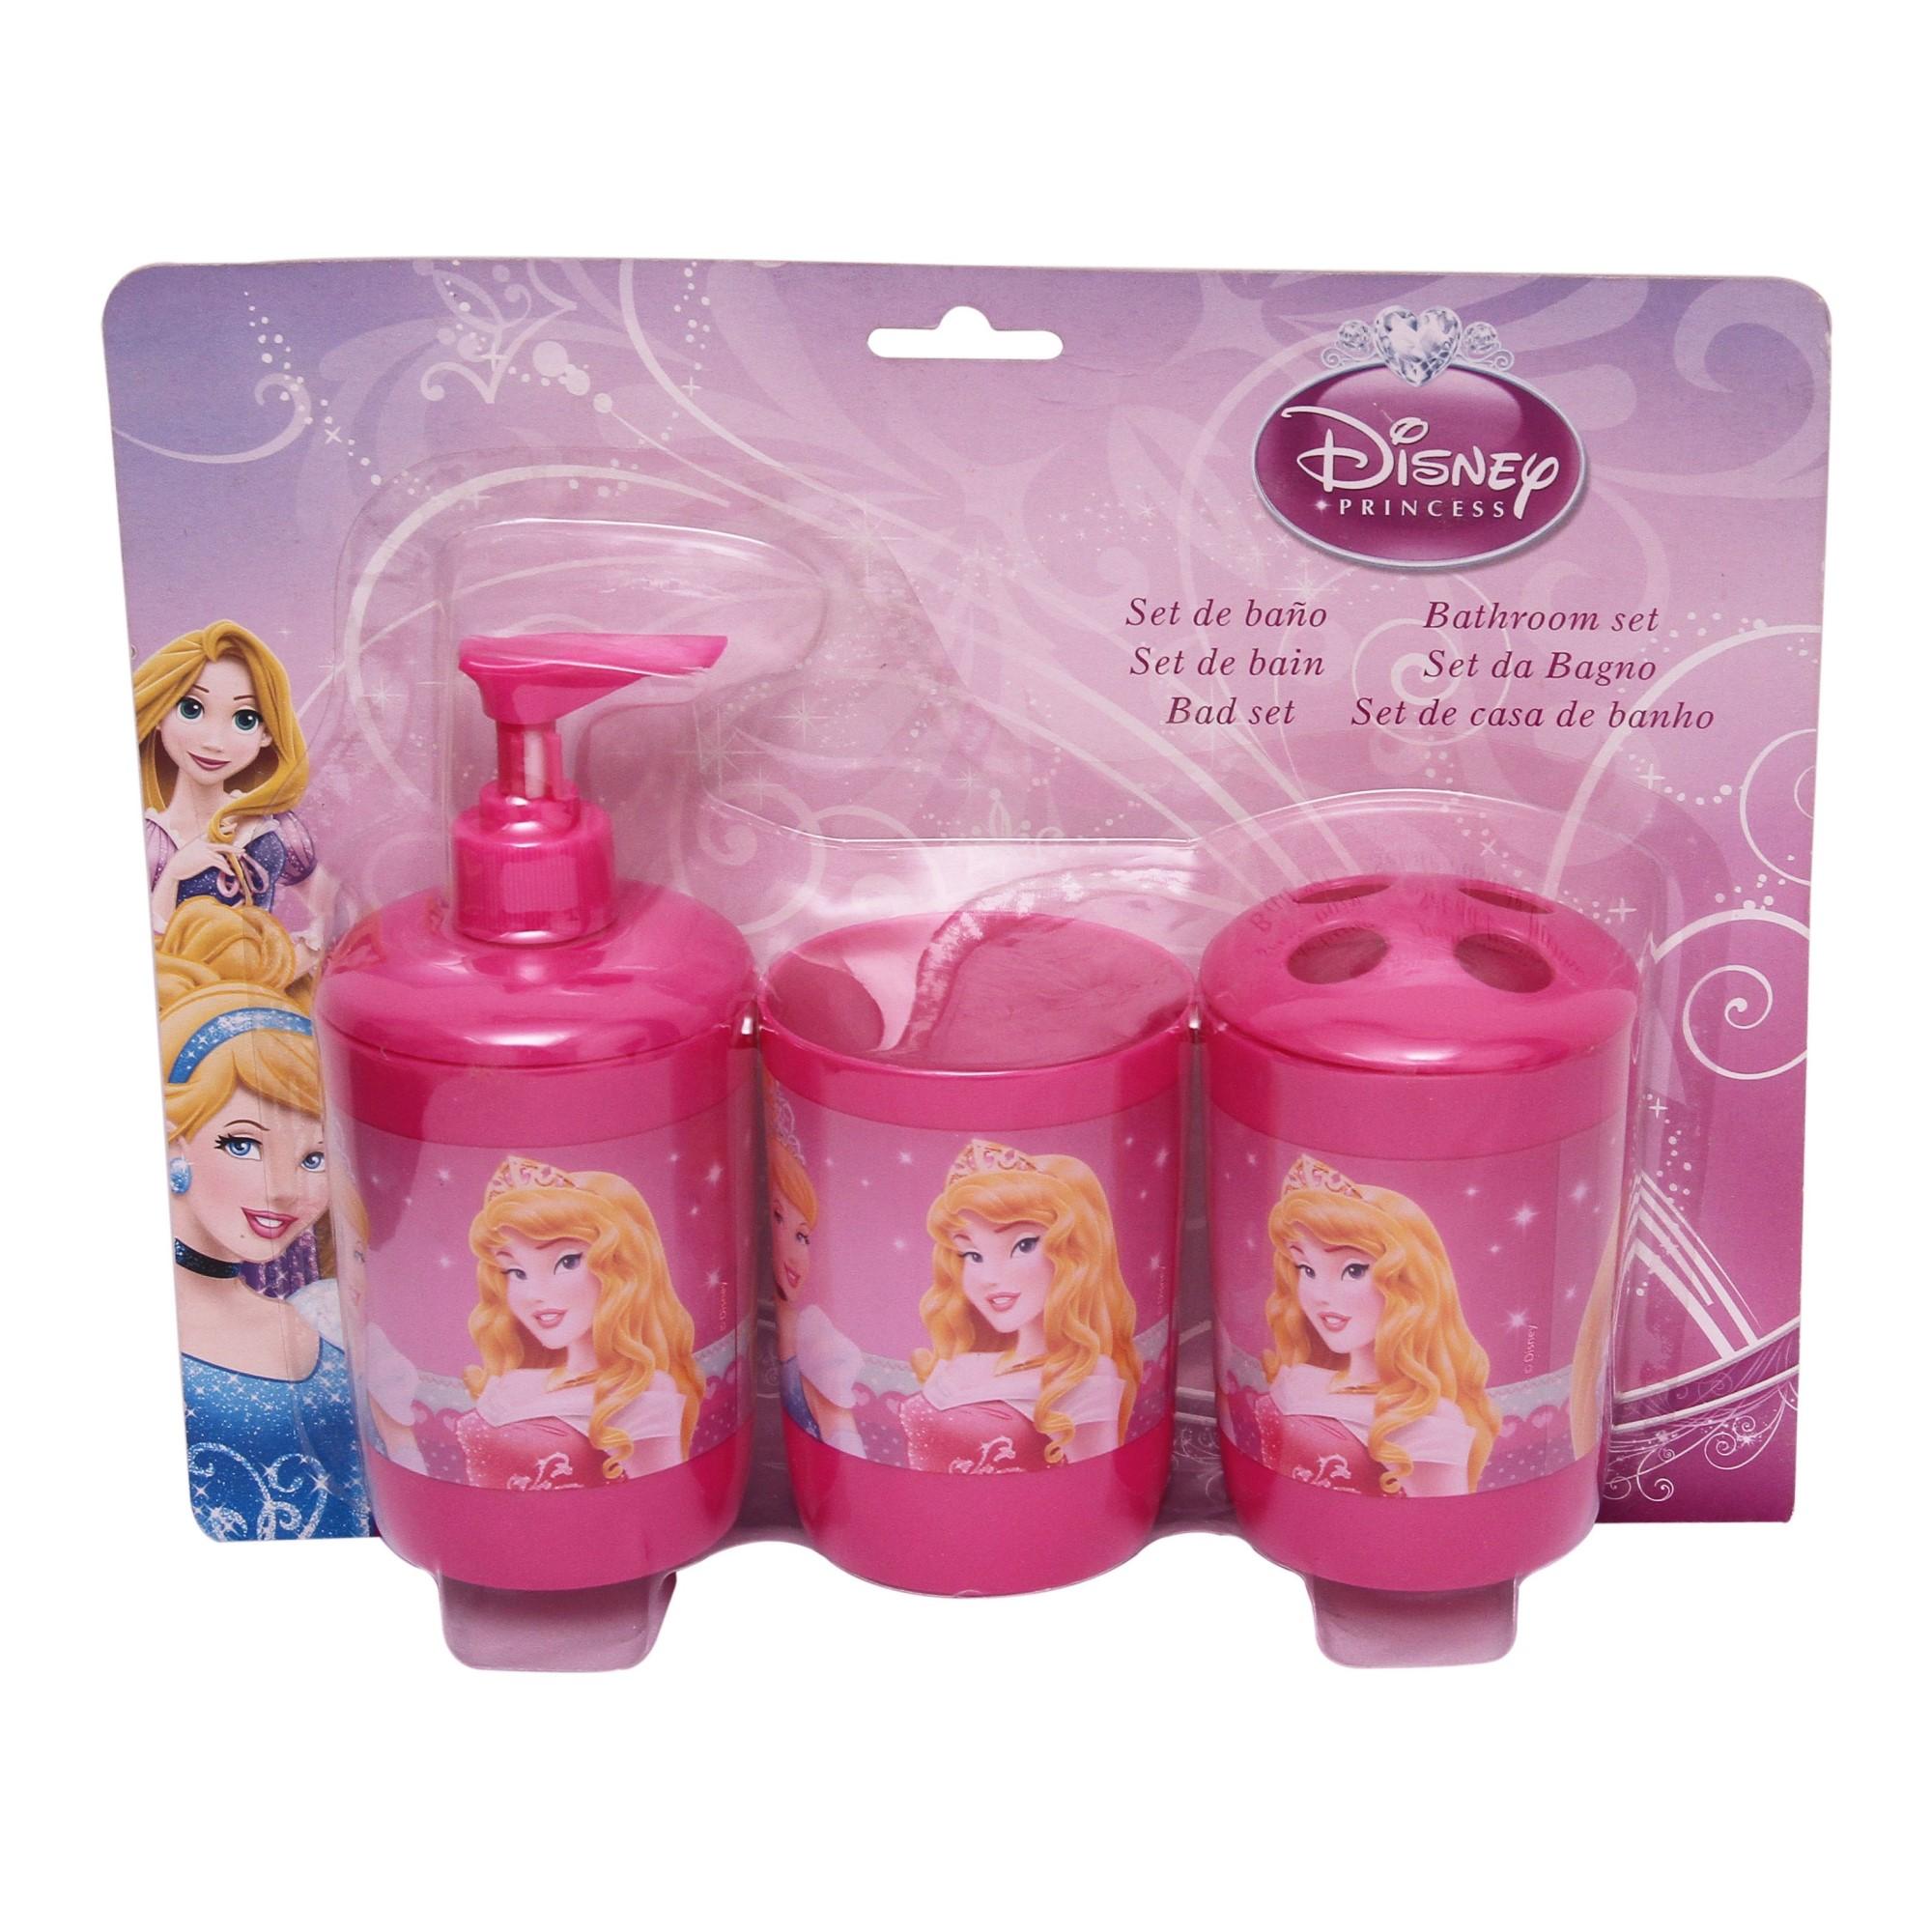 Disney Princess 3 Pieces Bathroom Set